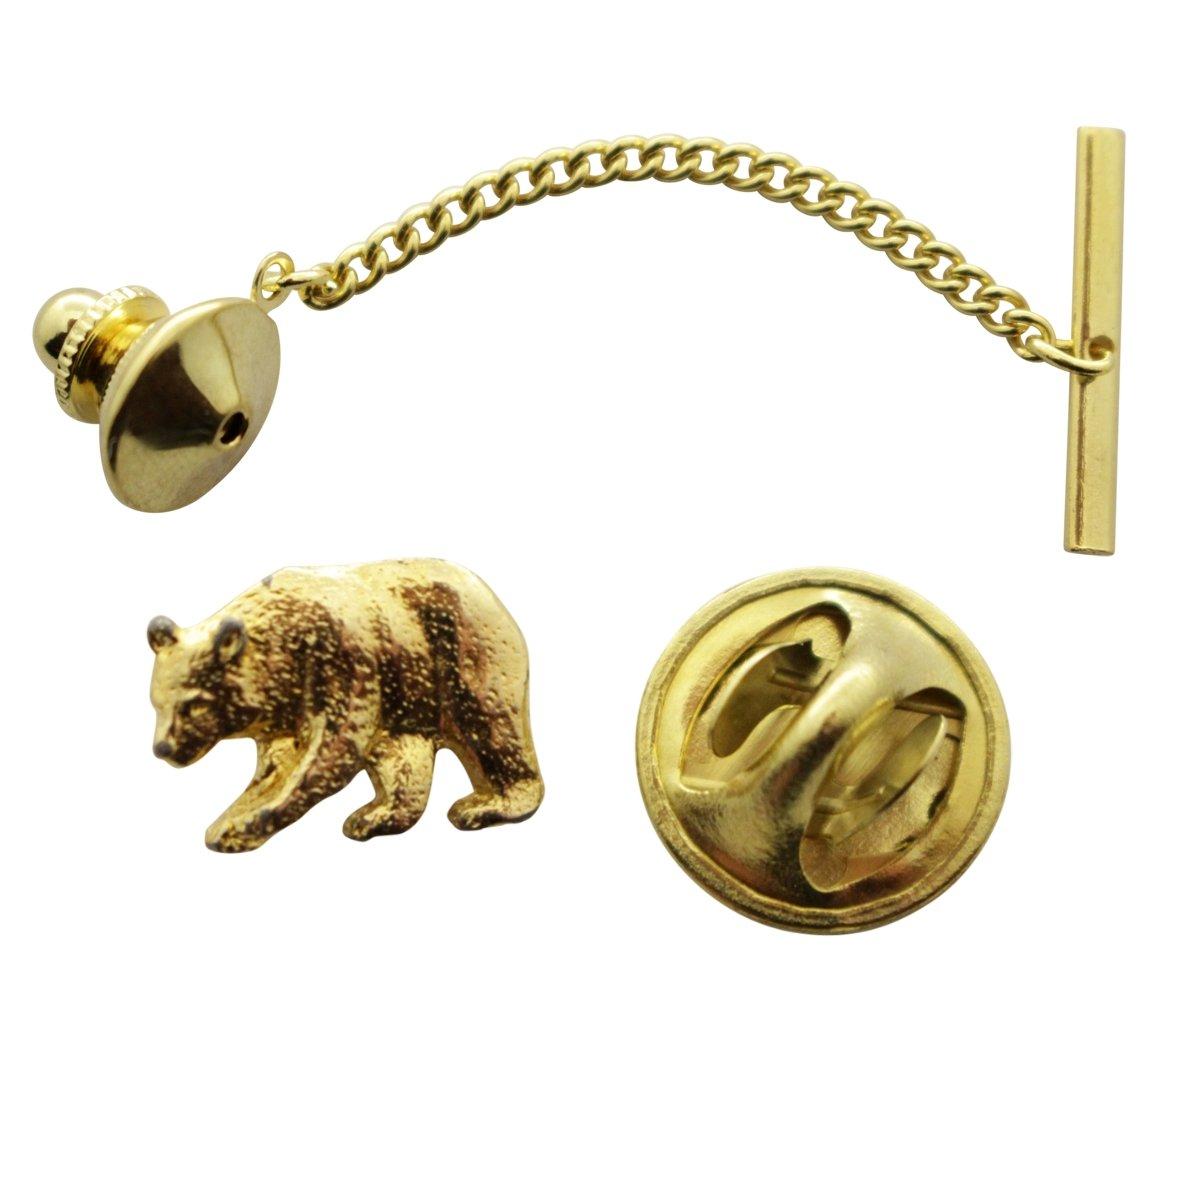 Bear Tie Tack ~ 24K Gold ~ Tie Tack or Pin ~ Sarah's Treats & Treasures